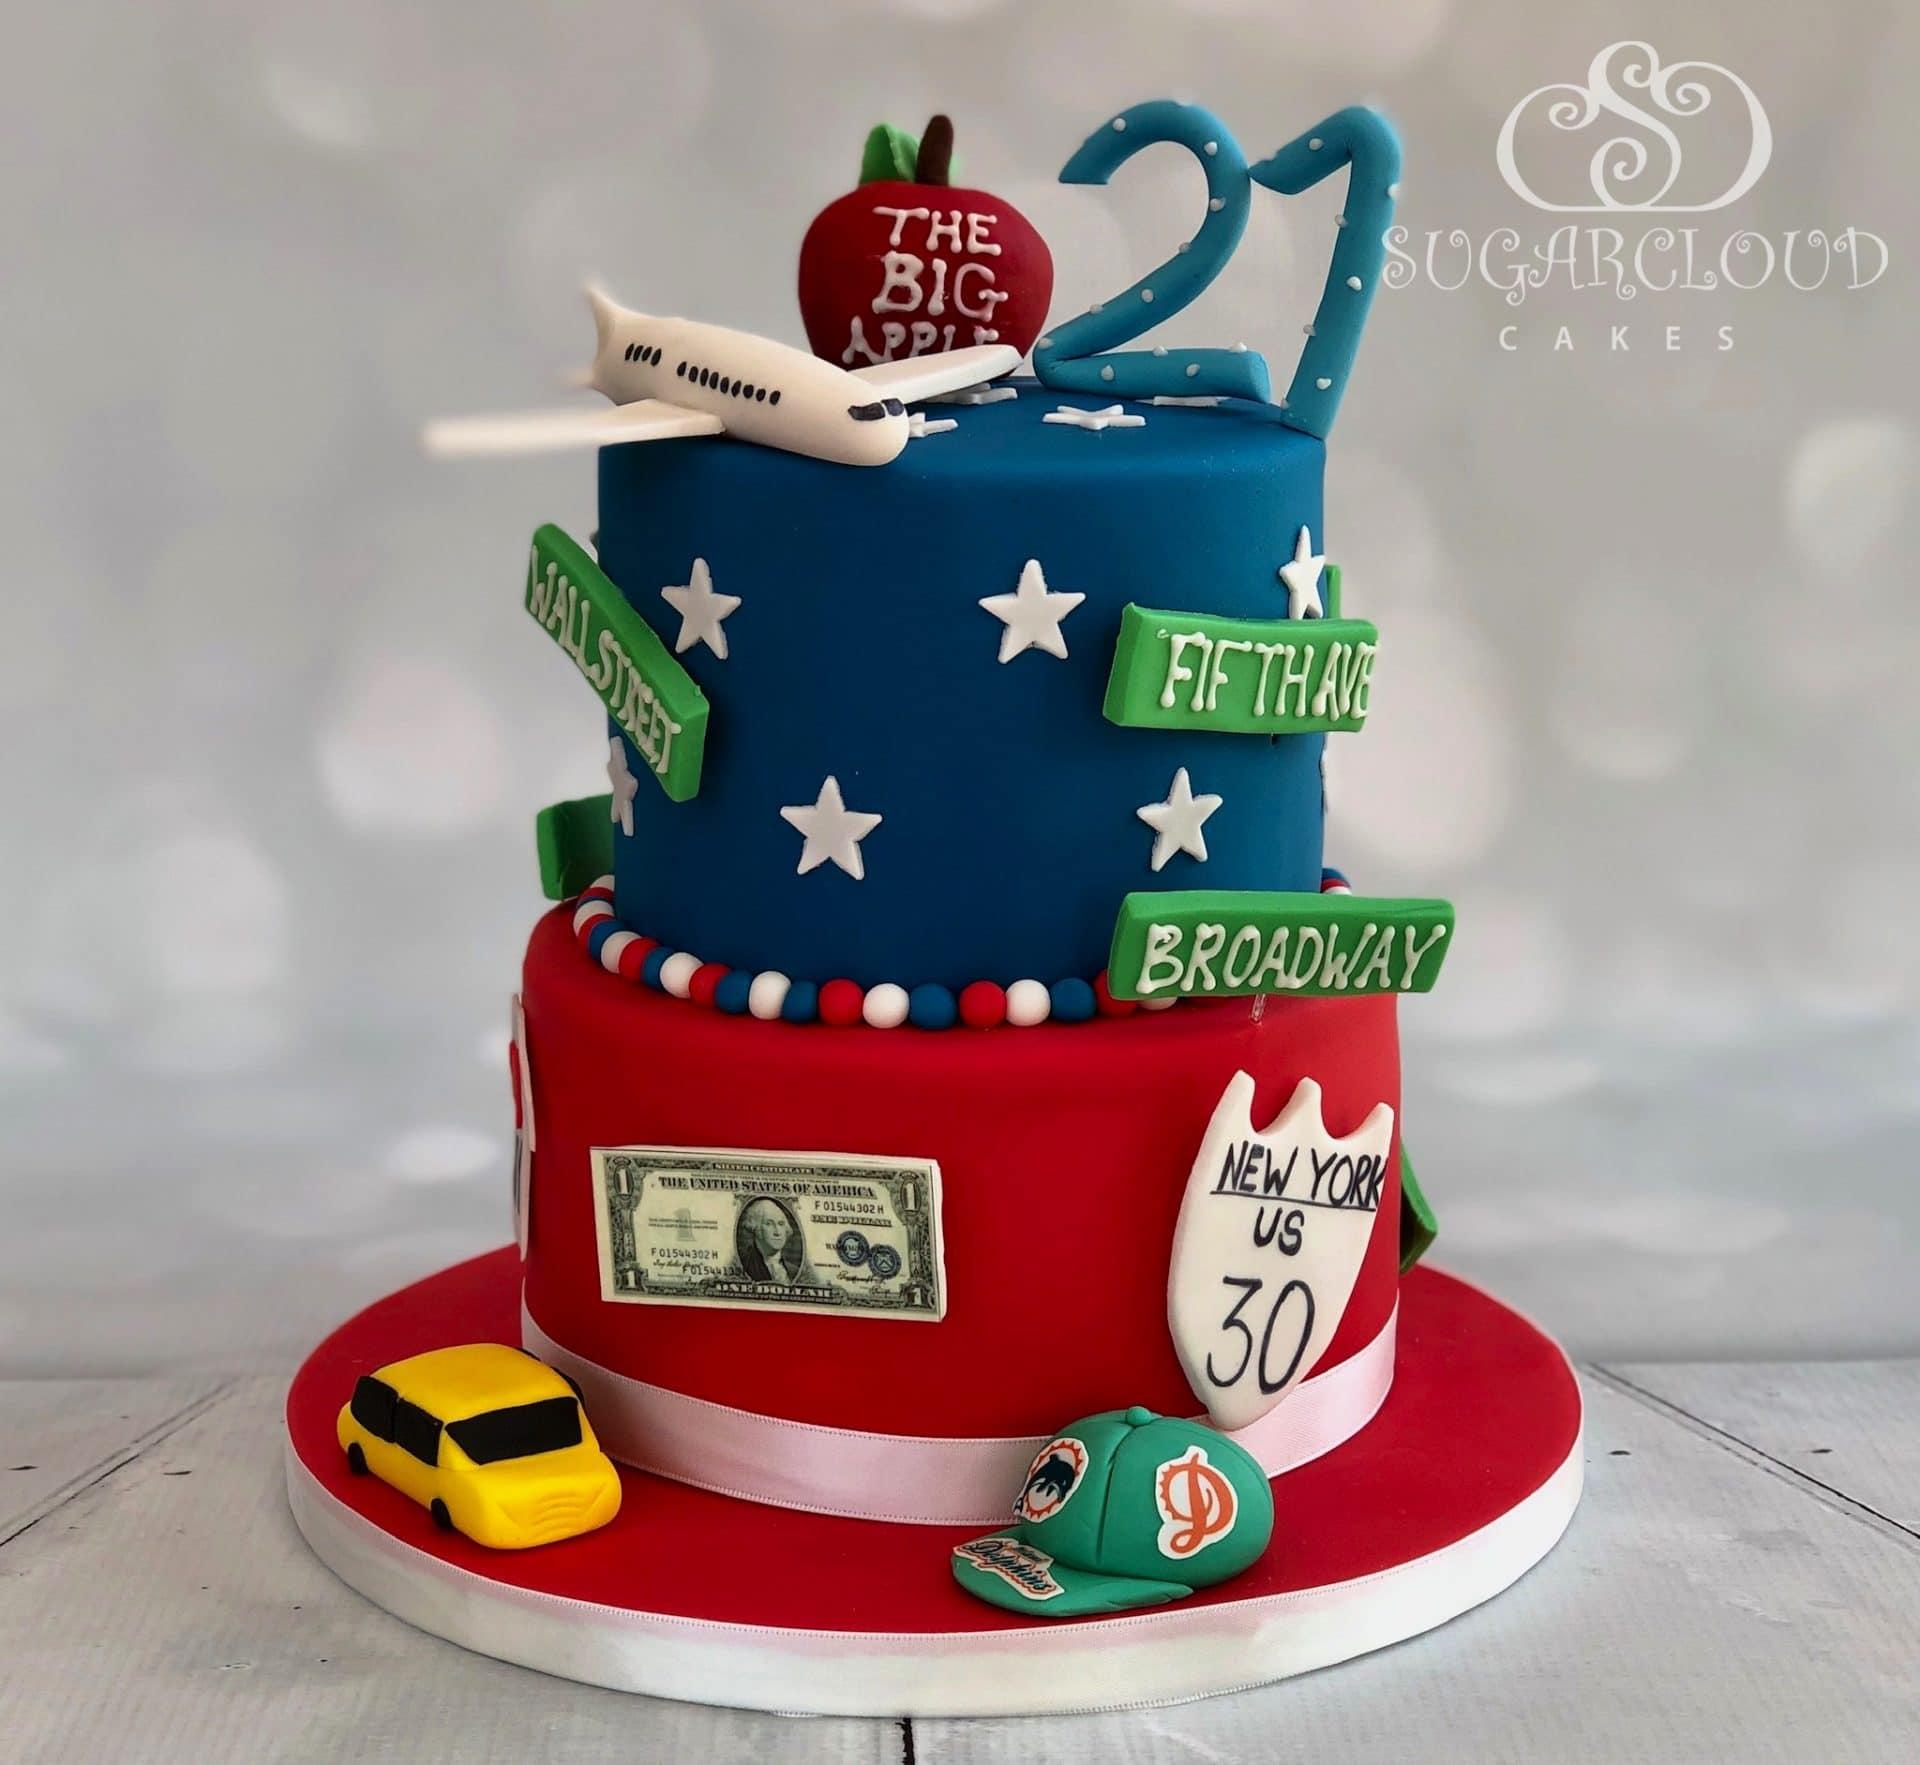 Awesome Sugar Cloud Cakes Cake Designer Haslington Crewe Cheshire Funny Birthday Cards Online Alyptdamsfinfo